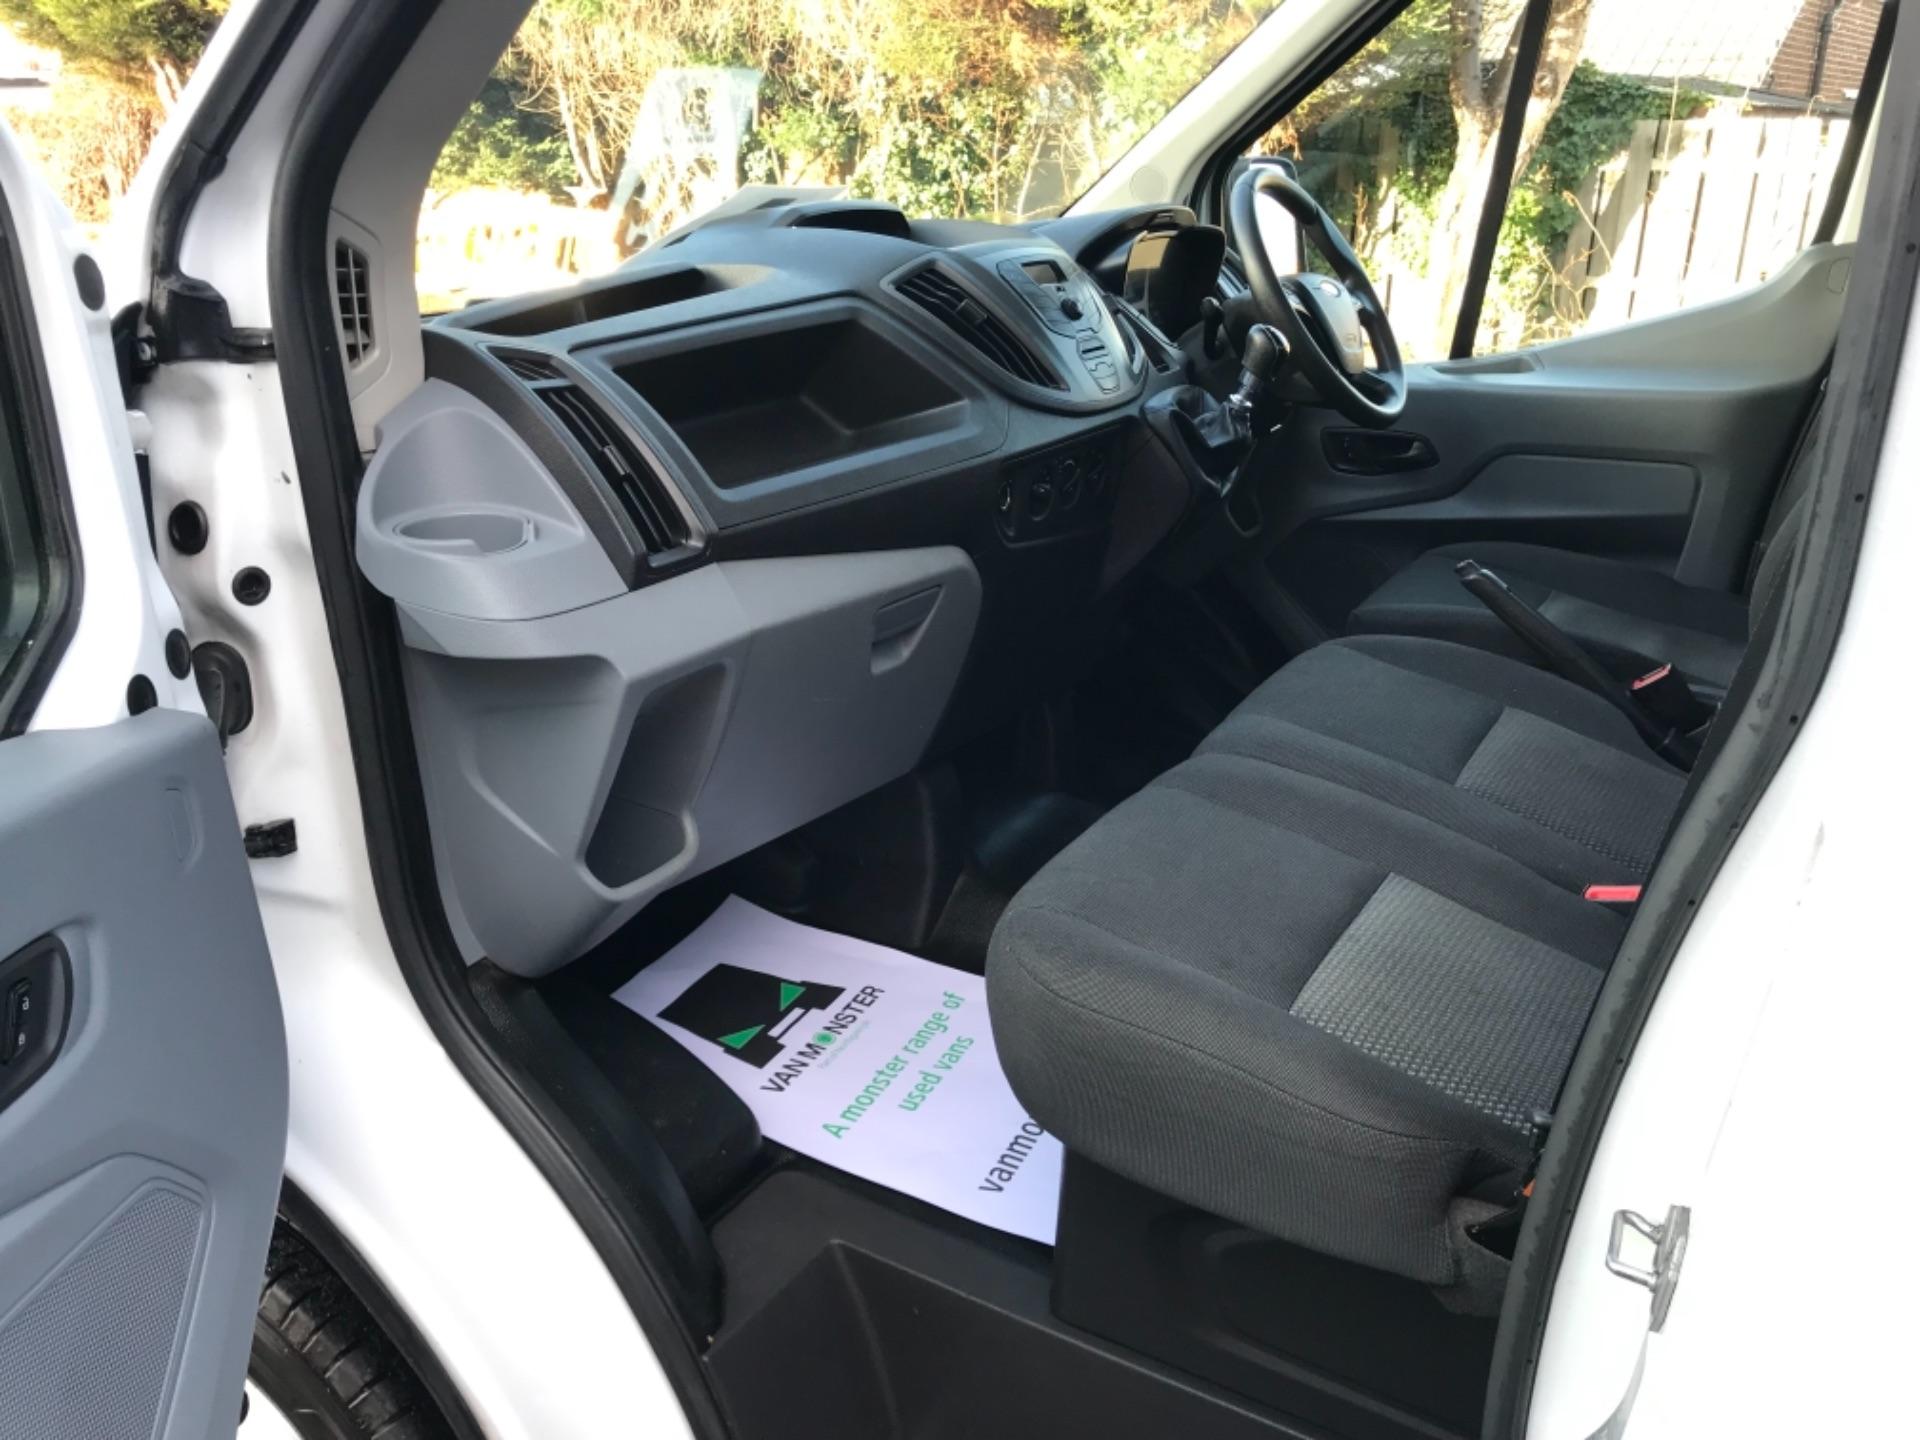 2016 Ford Transit 2.2 Tdci 125Ps Dropside DRW Tail lift (YS66SNU) Image 21